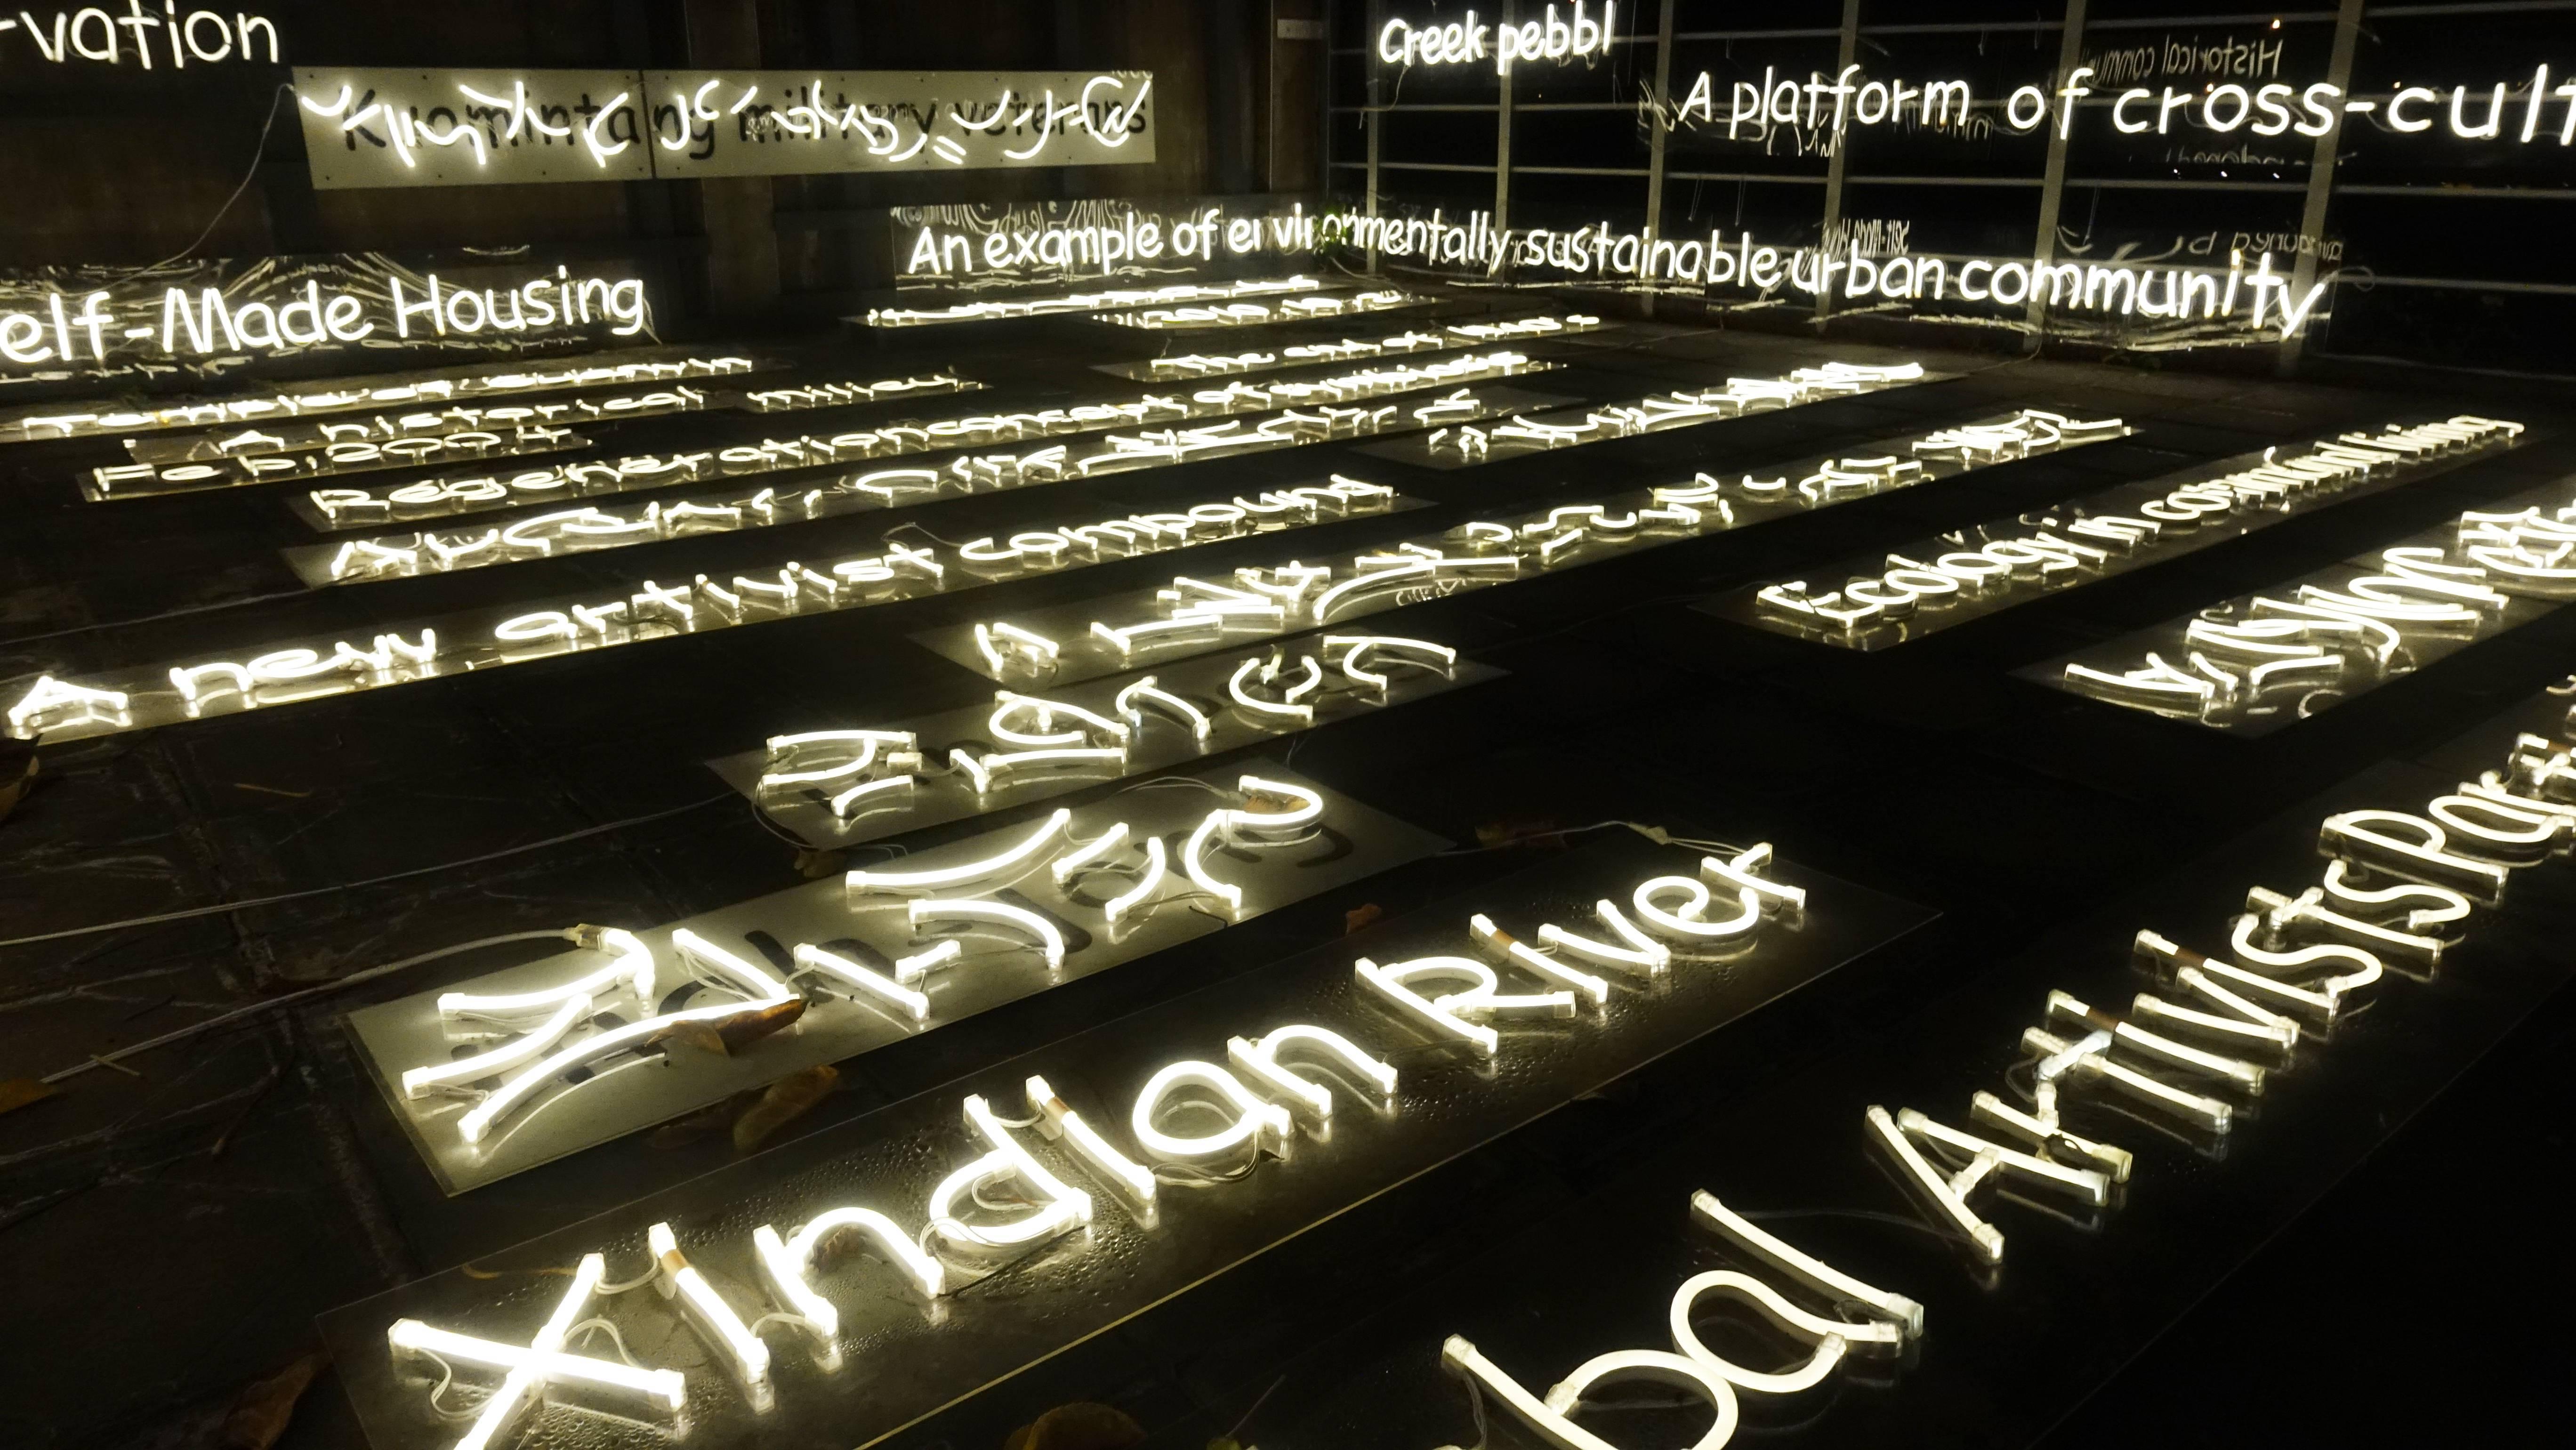 洪韵婷 HUNG Yun-Ting,〈影子〉Shadow 。圖/非池中藝術網攝。